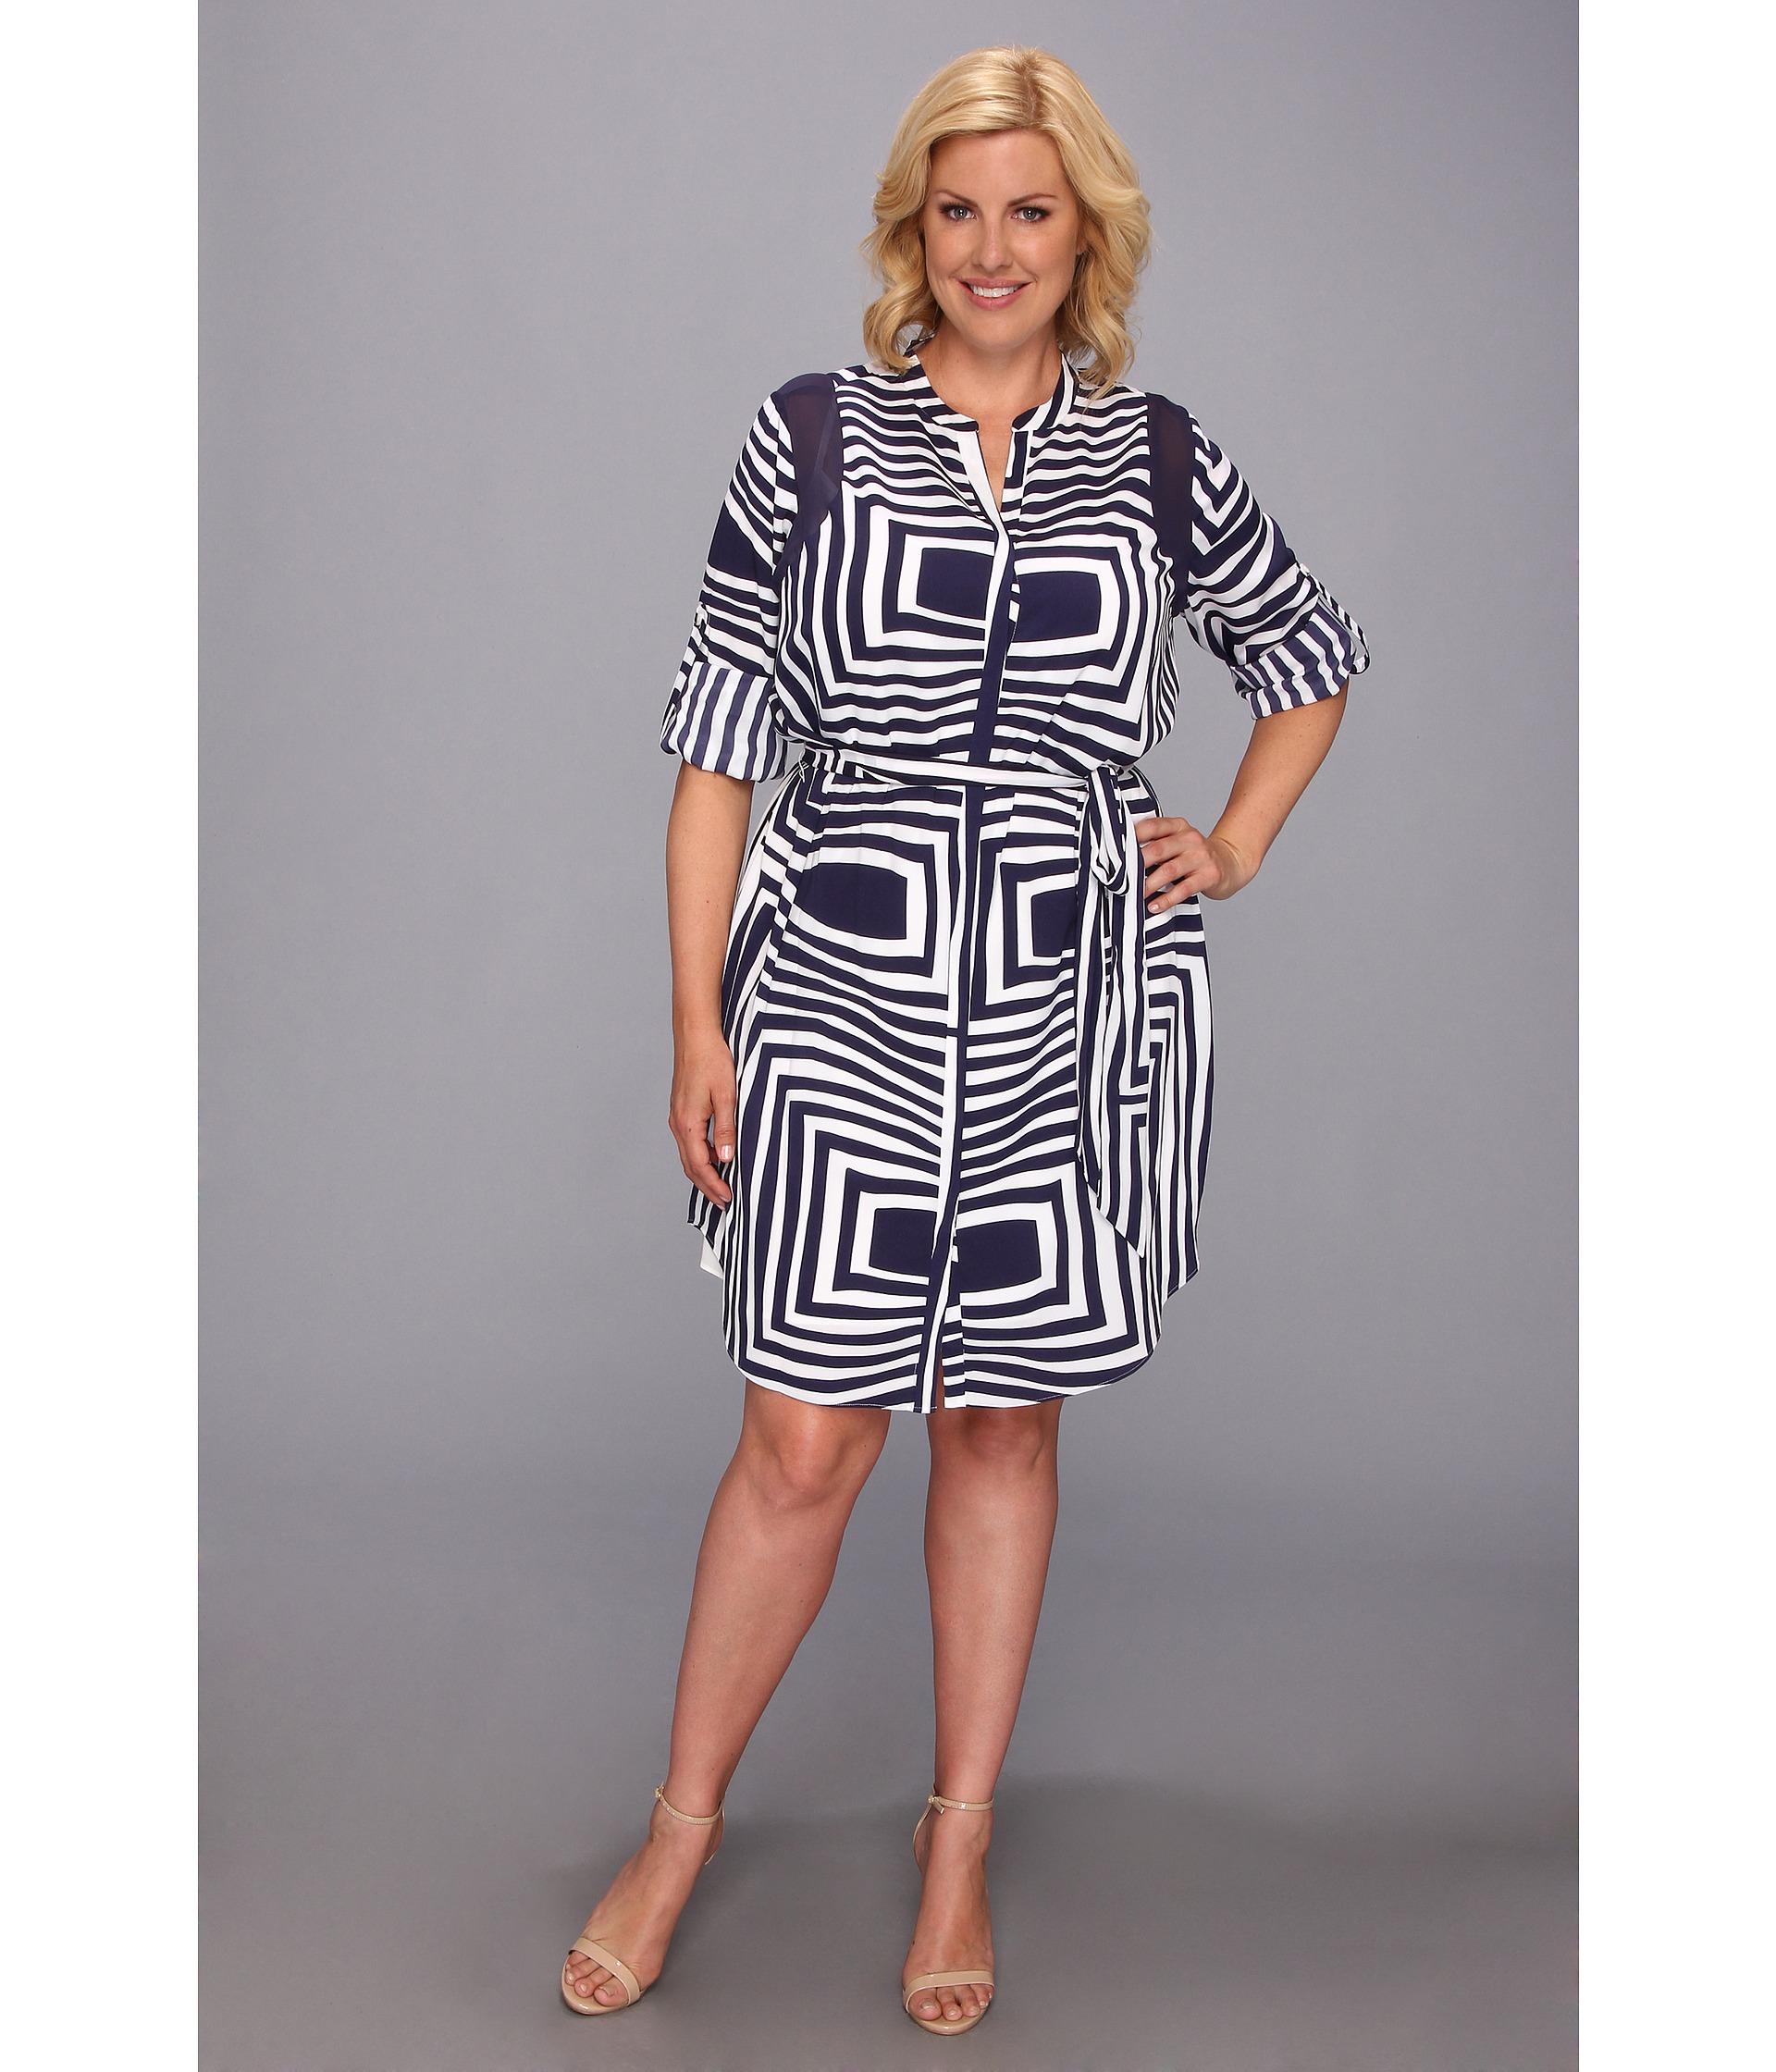 756d5c7f9ce8 DKNY Plus Size Roman Stripe Crepe De Chine Ls Yneck Shirt Dress W Chiffon  Shoulder Insert in Blue - Lyst